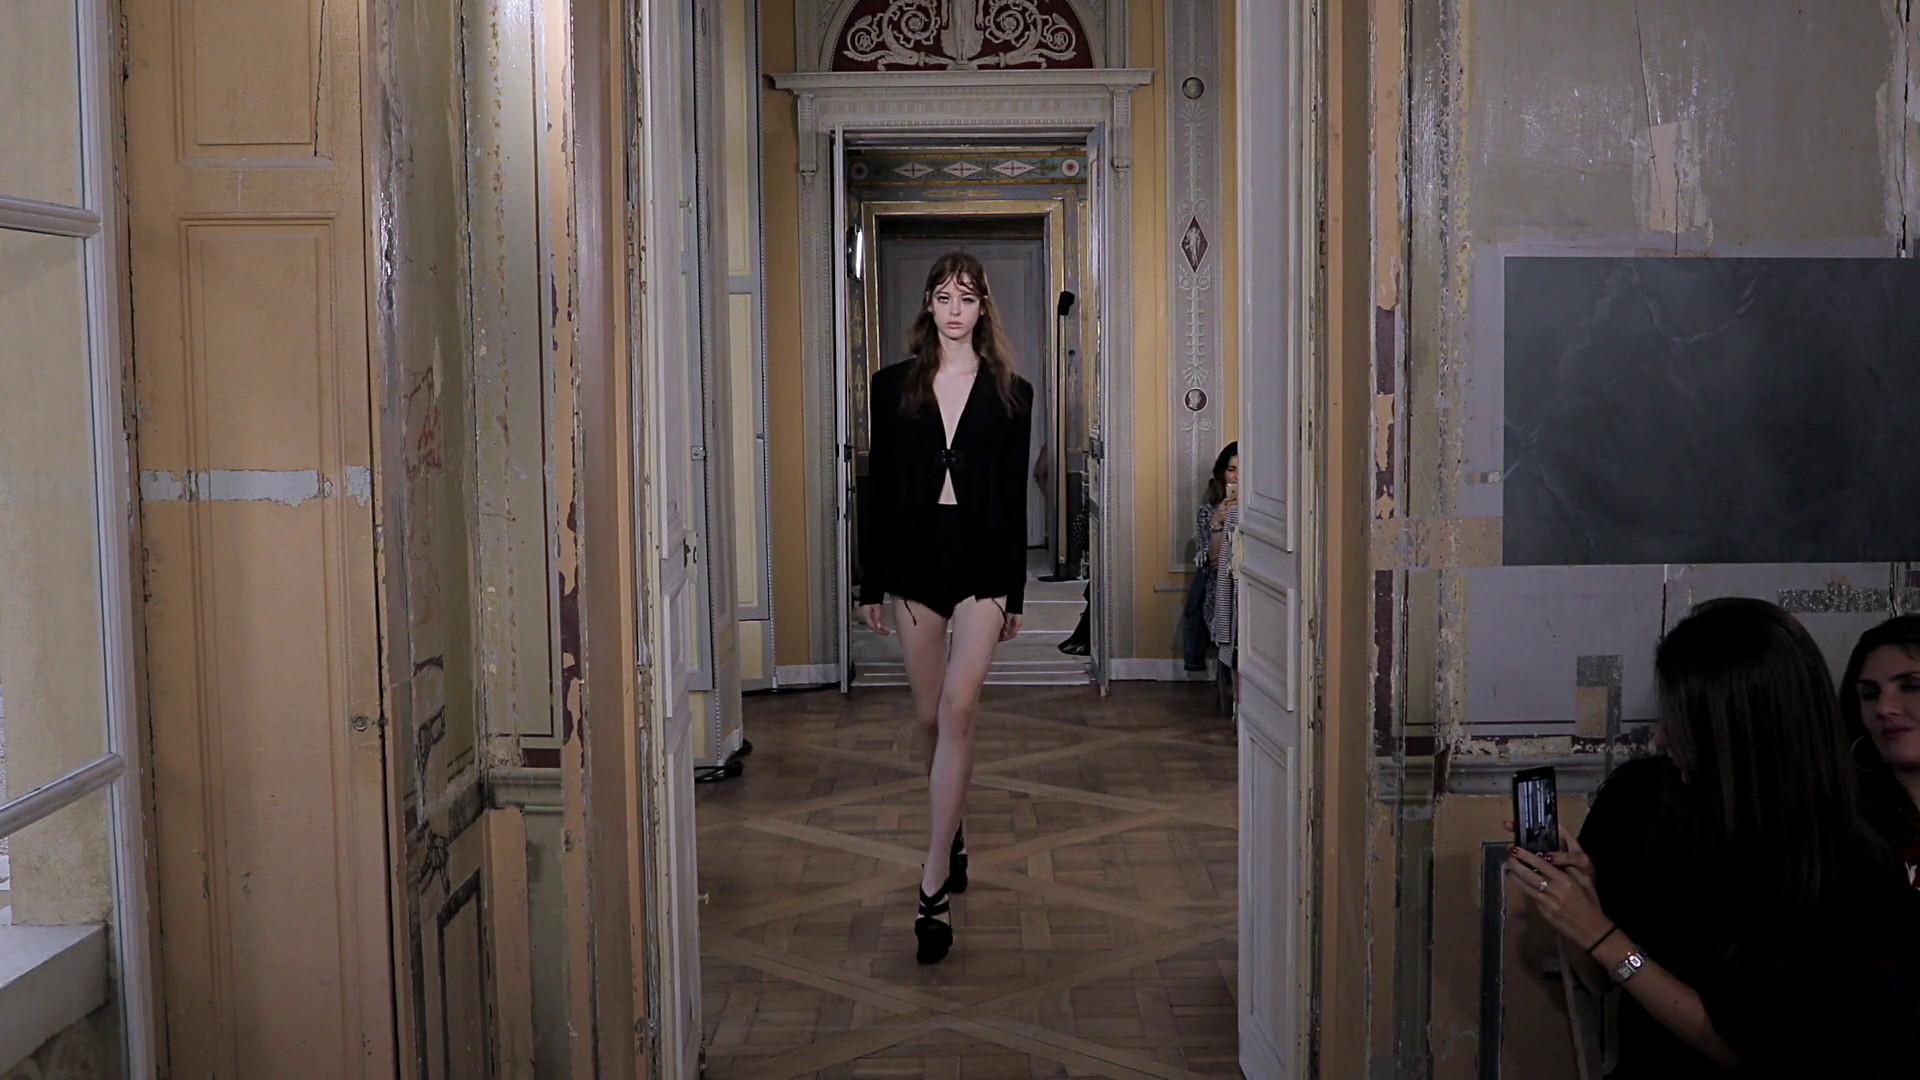 Olivier Theyskens Spring Summer 2020 Women's Fashion Show - Paris Fashion Week